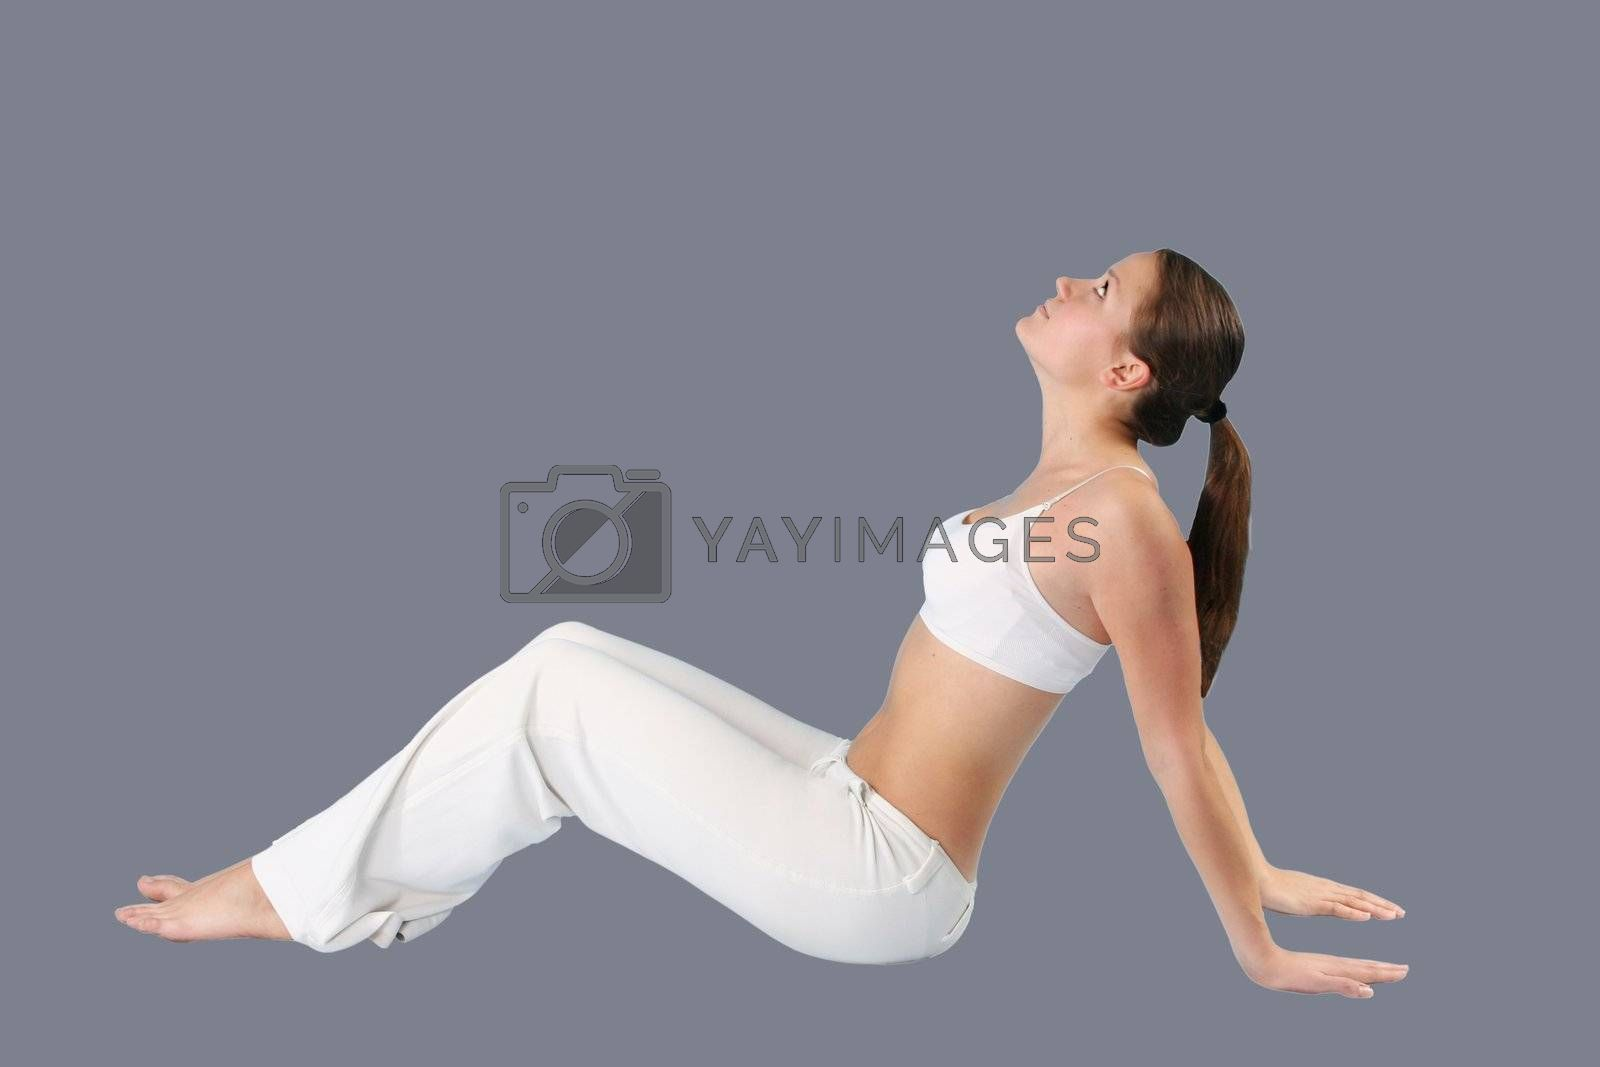 gray lifestyles females beautiful exercising slim body fitness